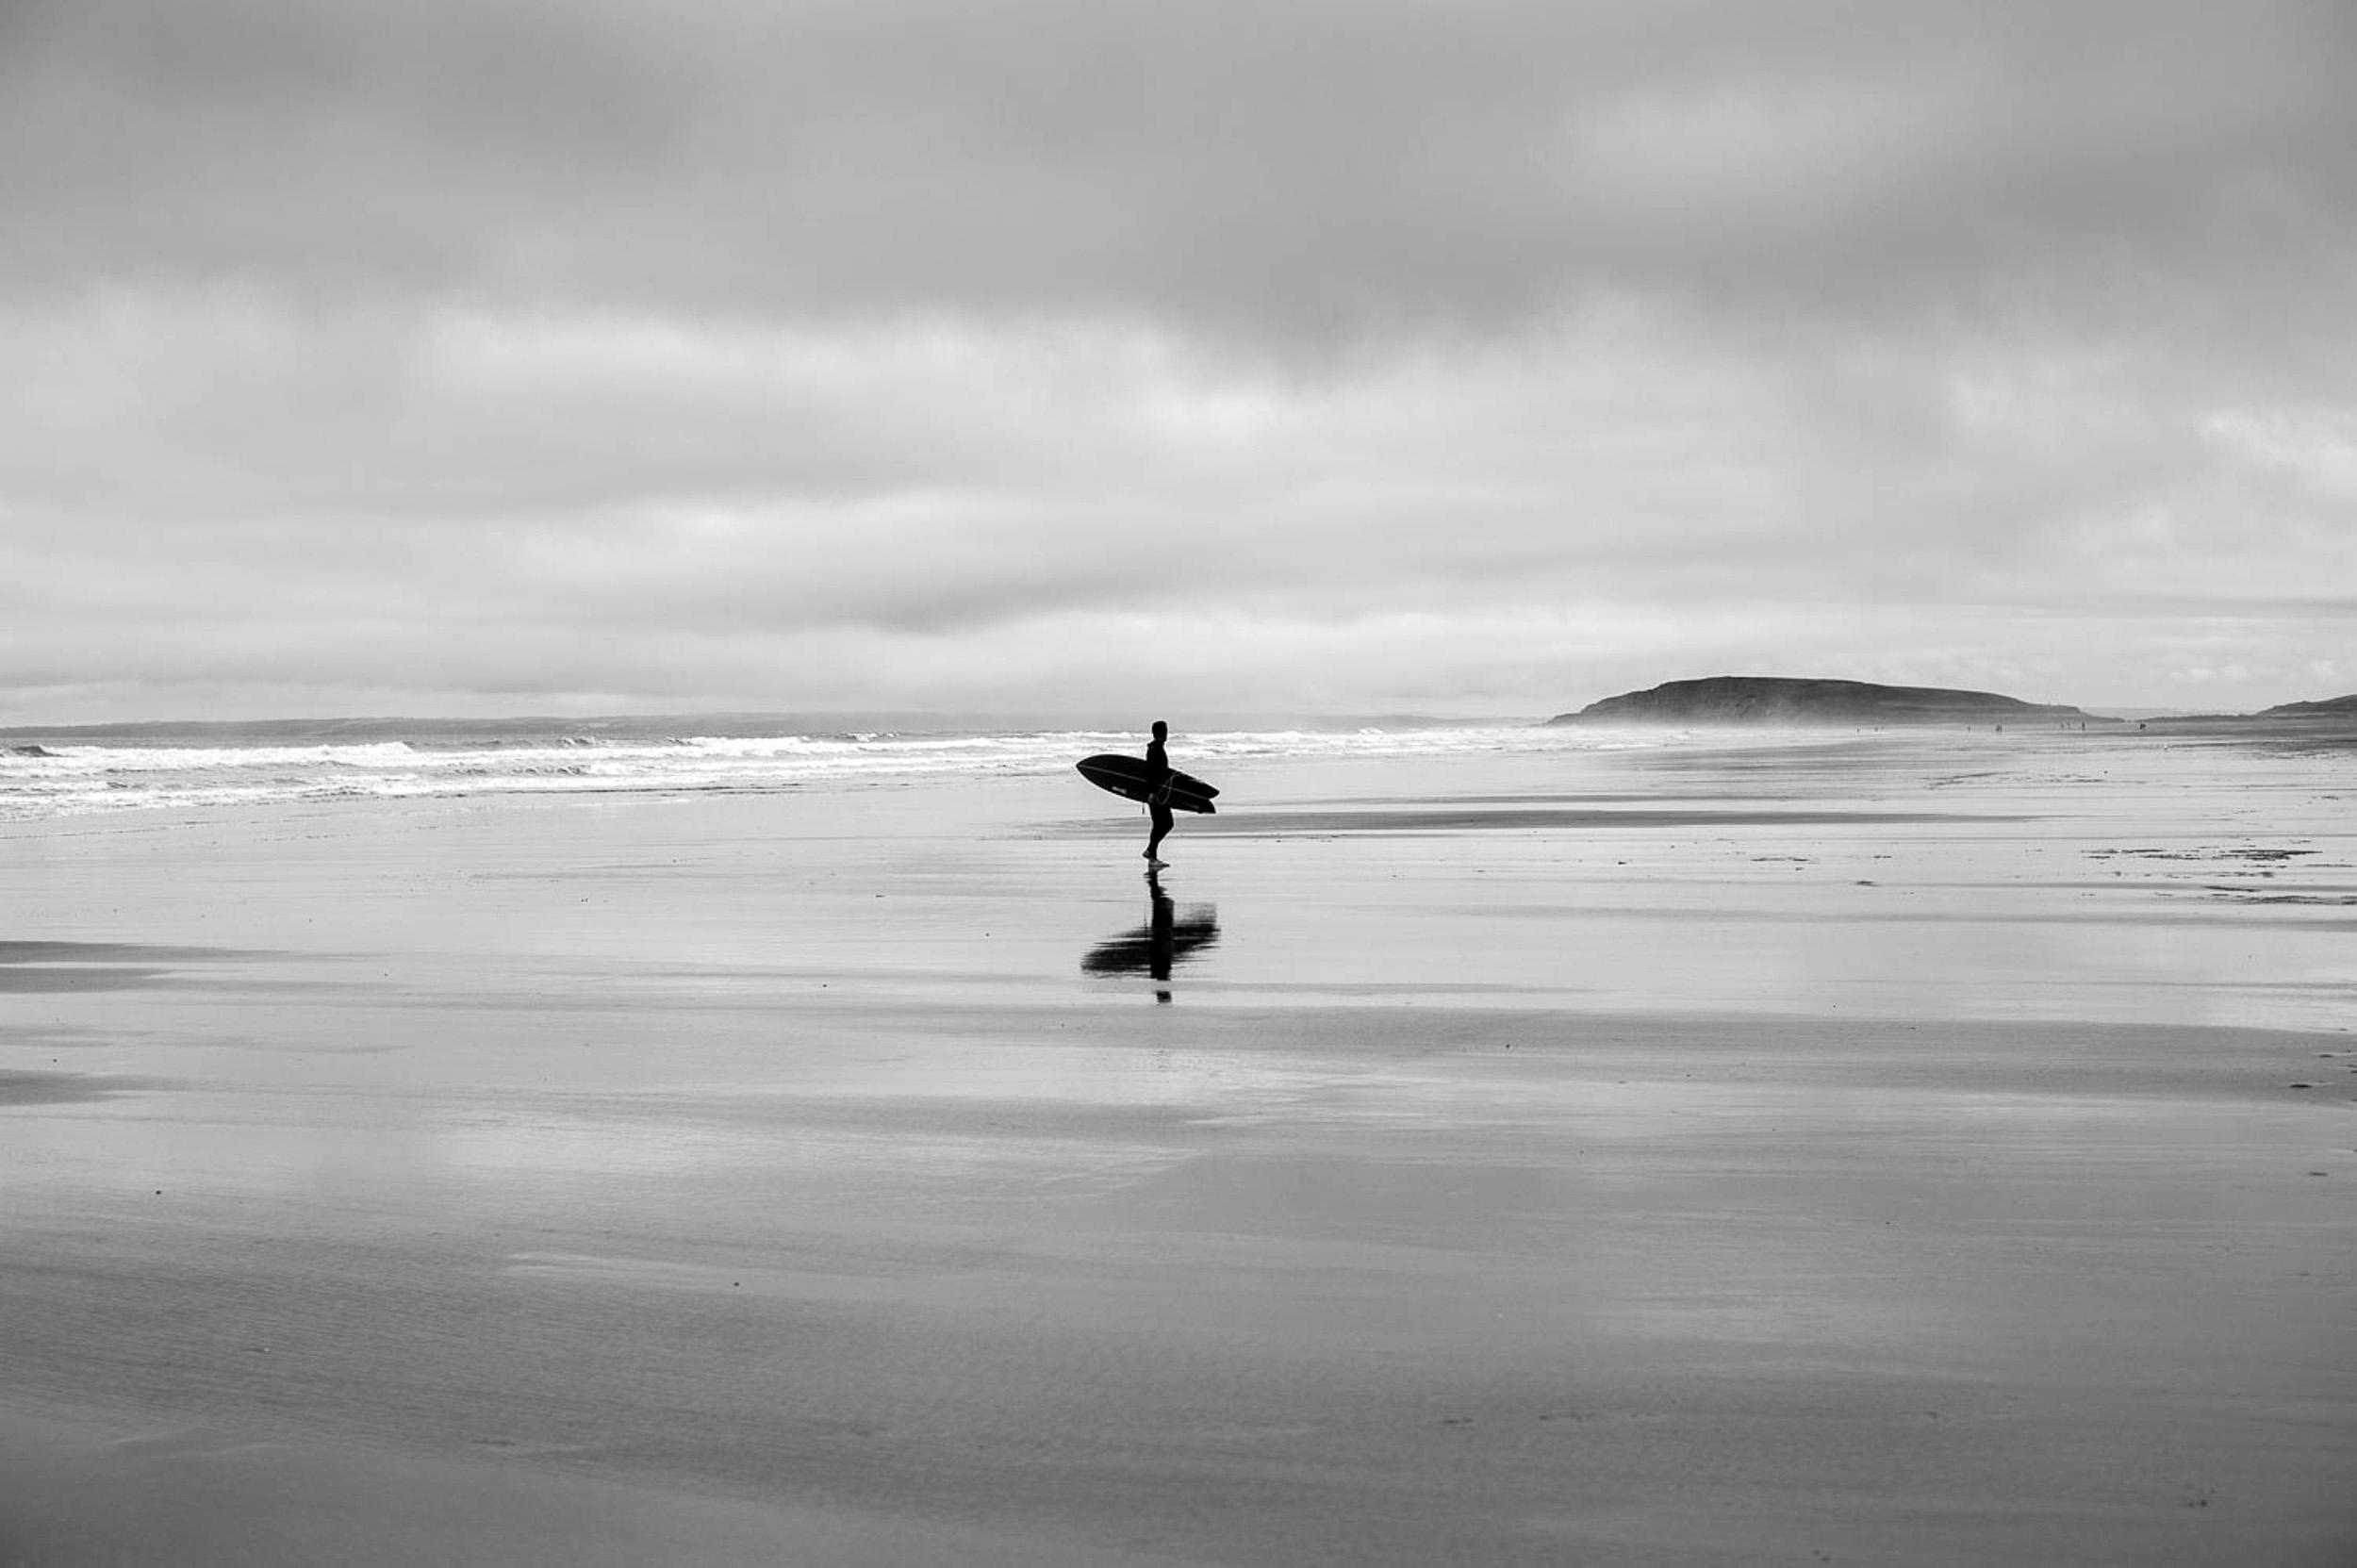 www.iaincrockart.com_not_work-Iain Crockart Surfer-2.jpg